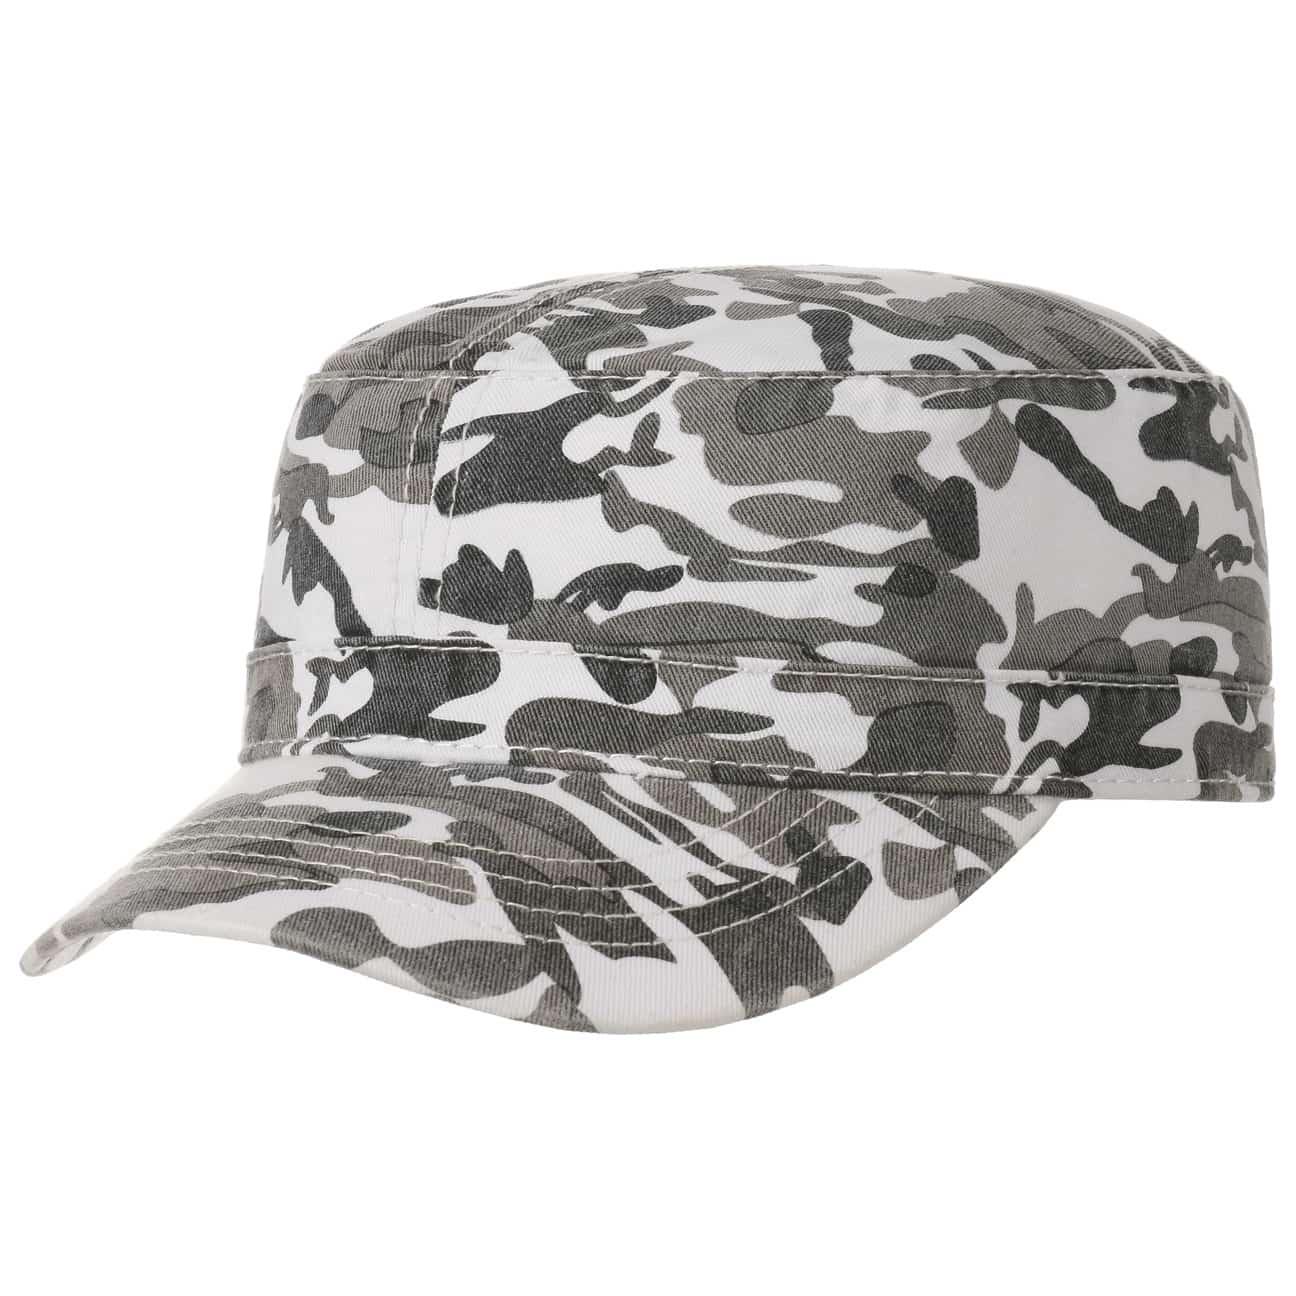 Gorra Army Camouflage Washed  gorra militar